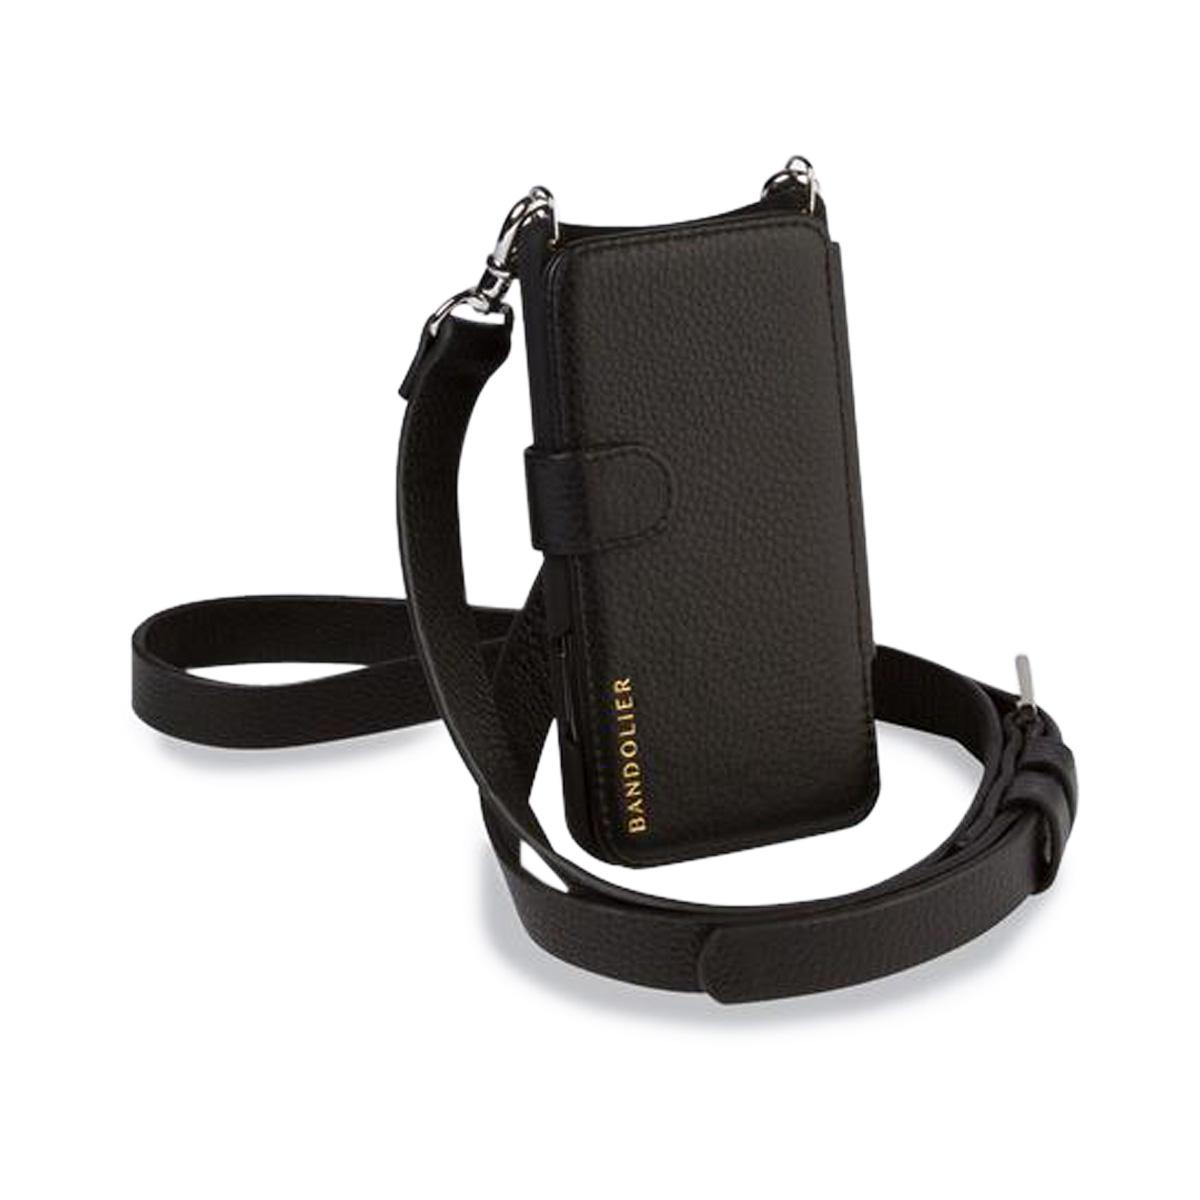 BANDOLIER HAILEY FOLIO SILVER バンドリヤー iPhone11 Pro ケース スマホ 携帯 ヘイリー フォーリオ シルバー メンズ レディース ブラック 黒 13HAI